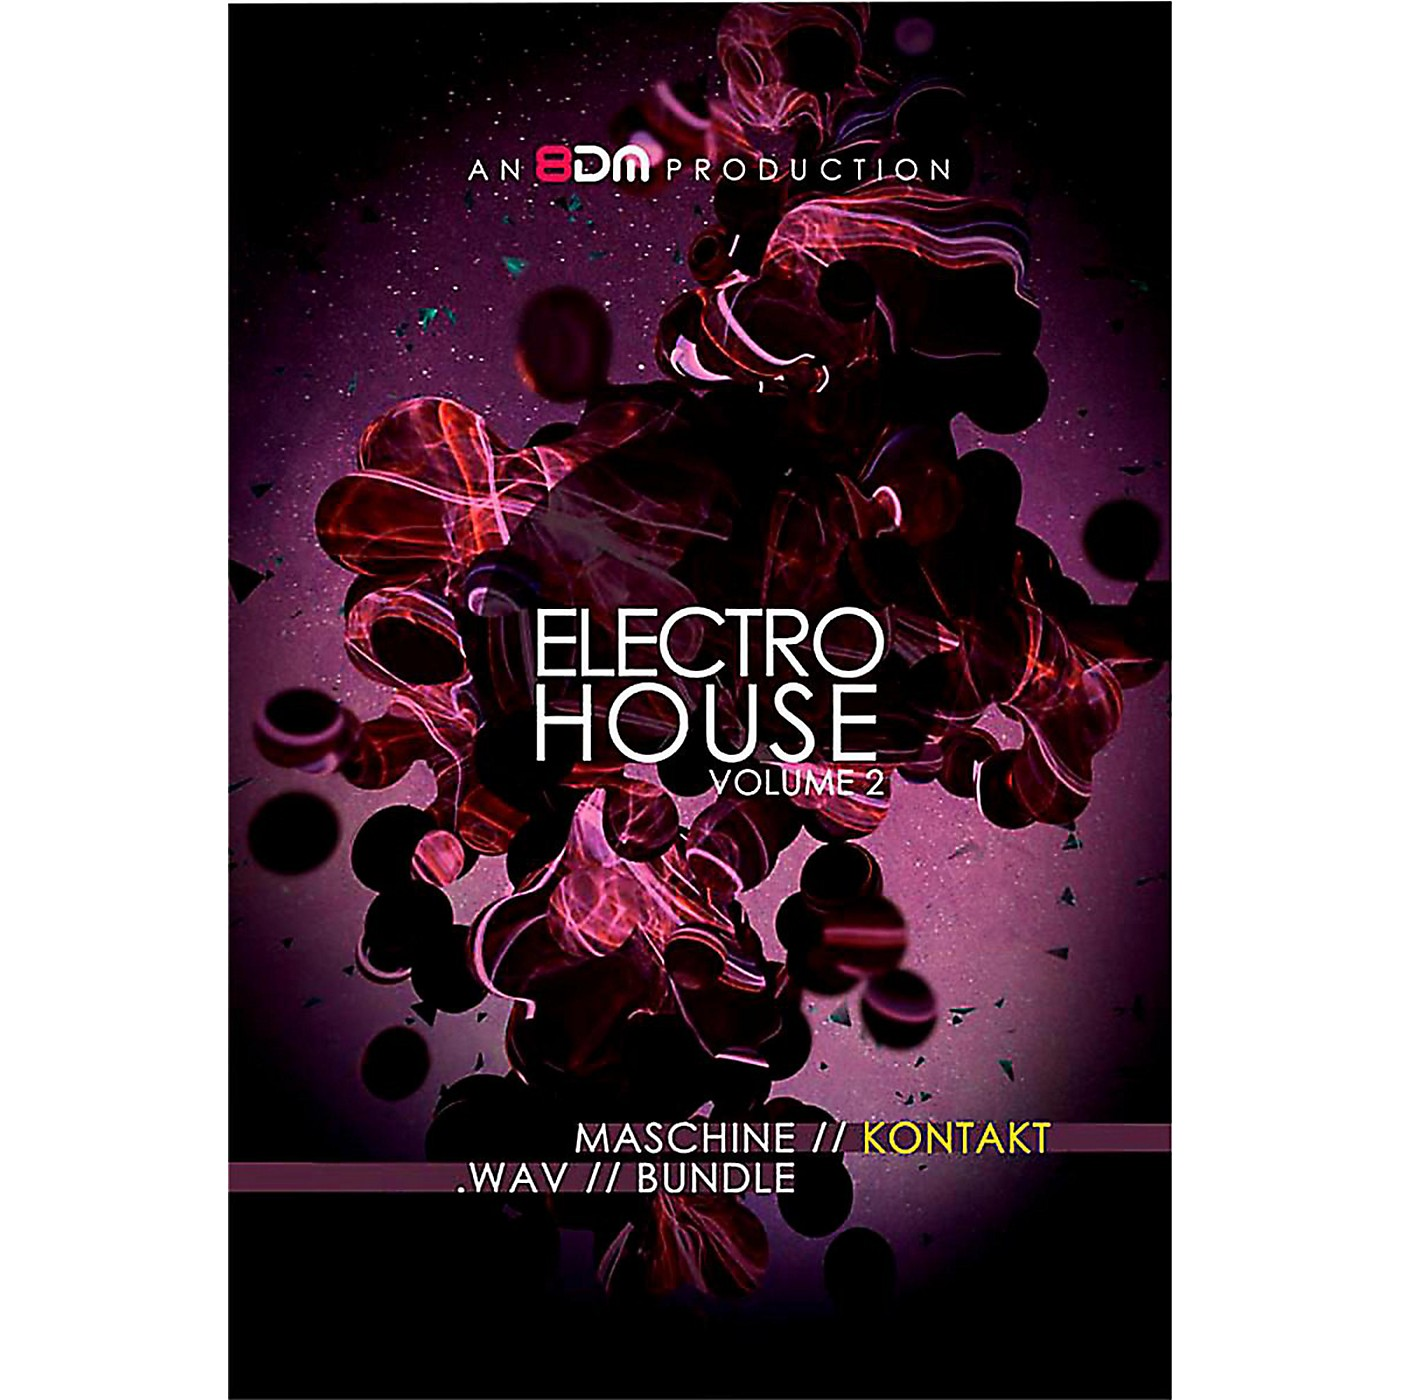 8DM Electro House Vol 2 for Kontakt thumbnail